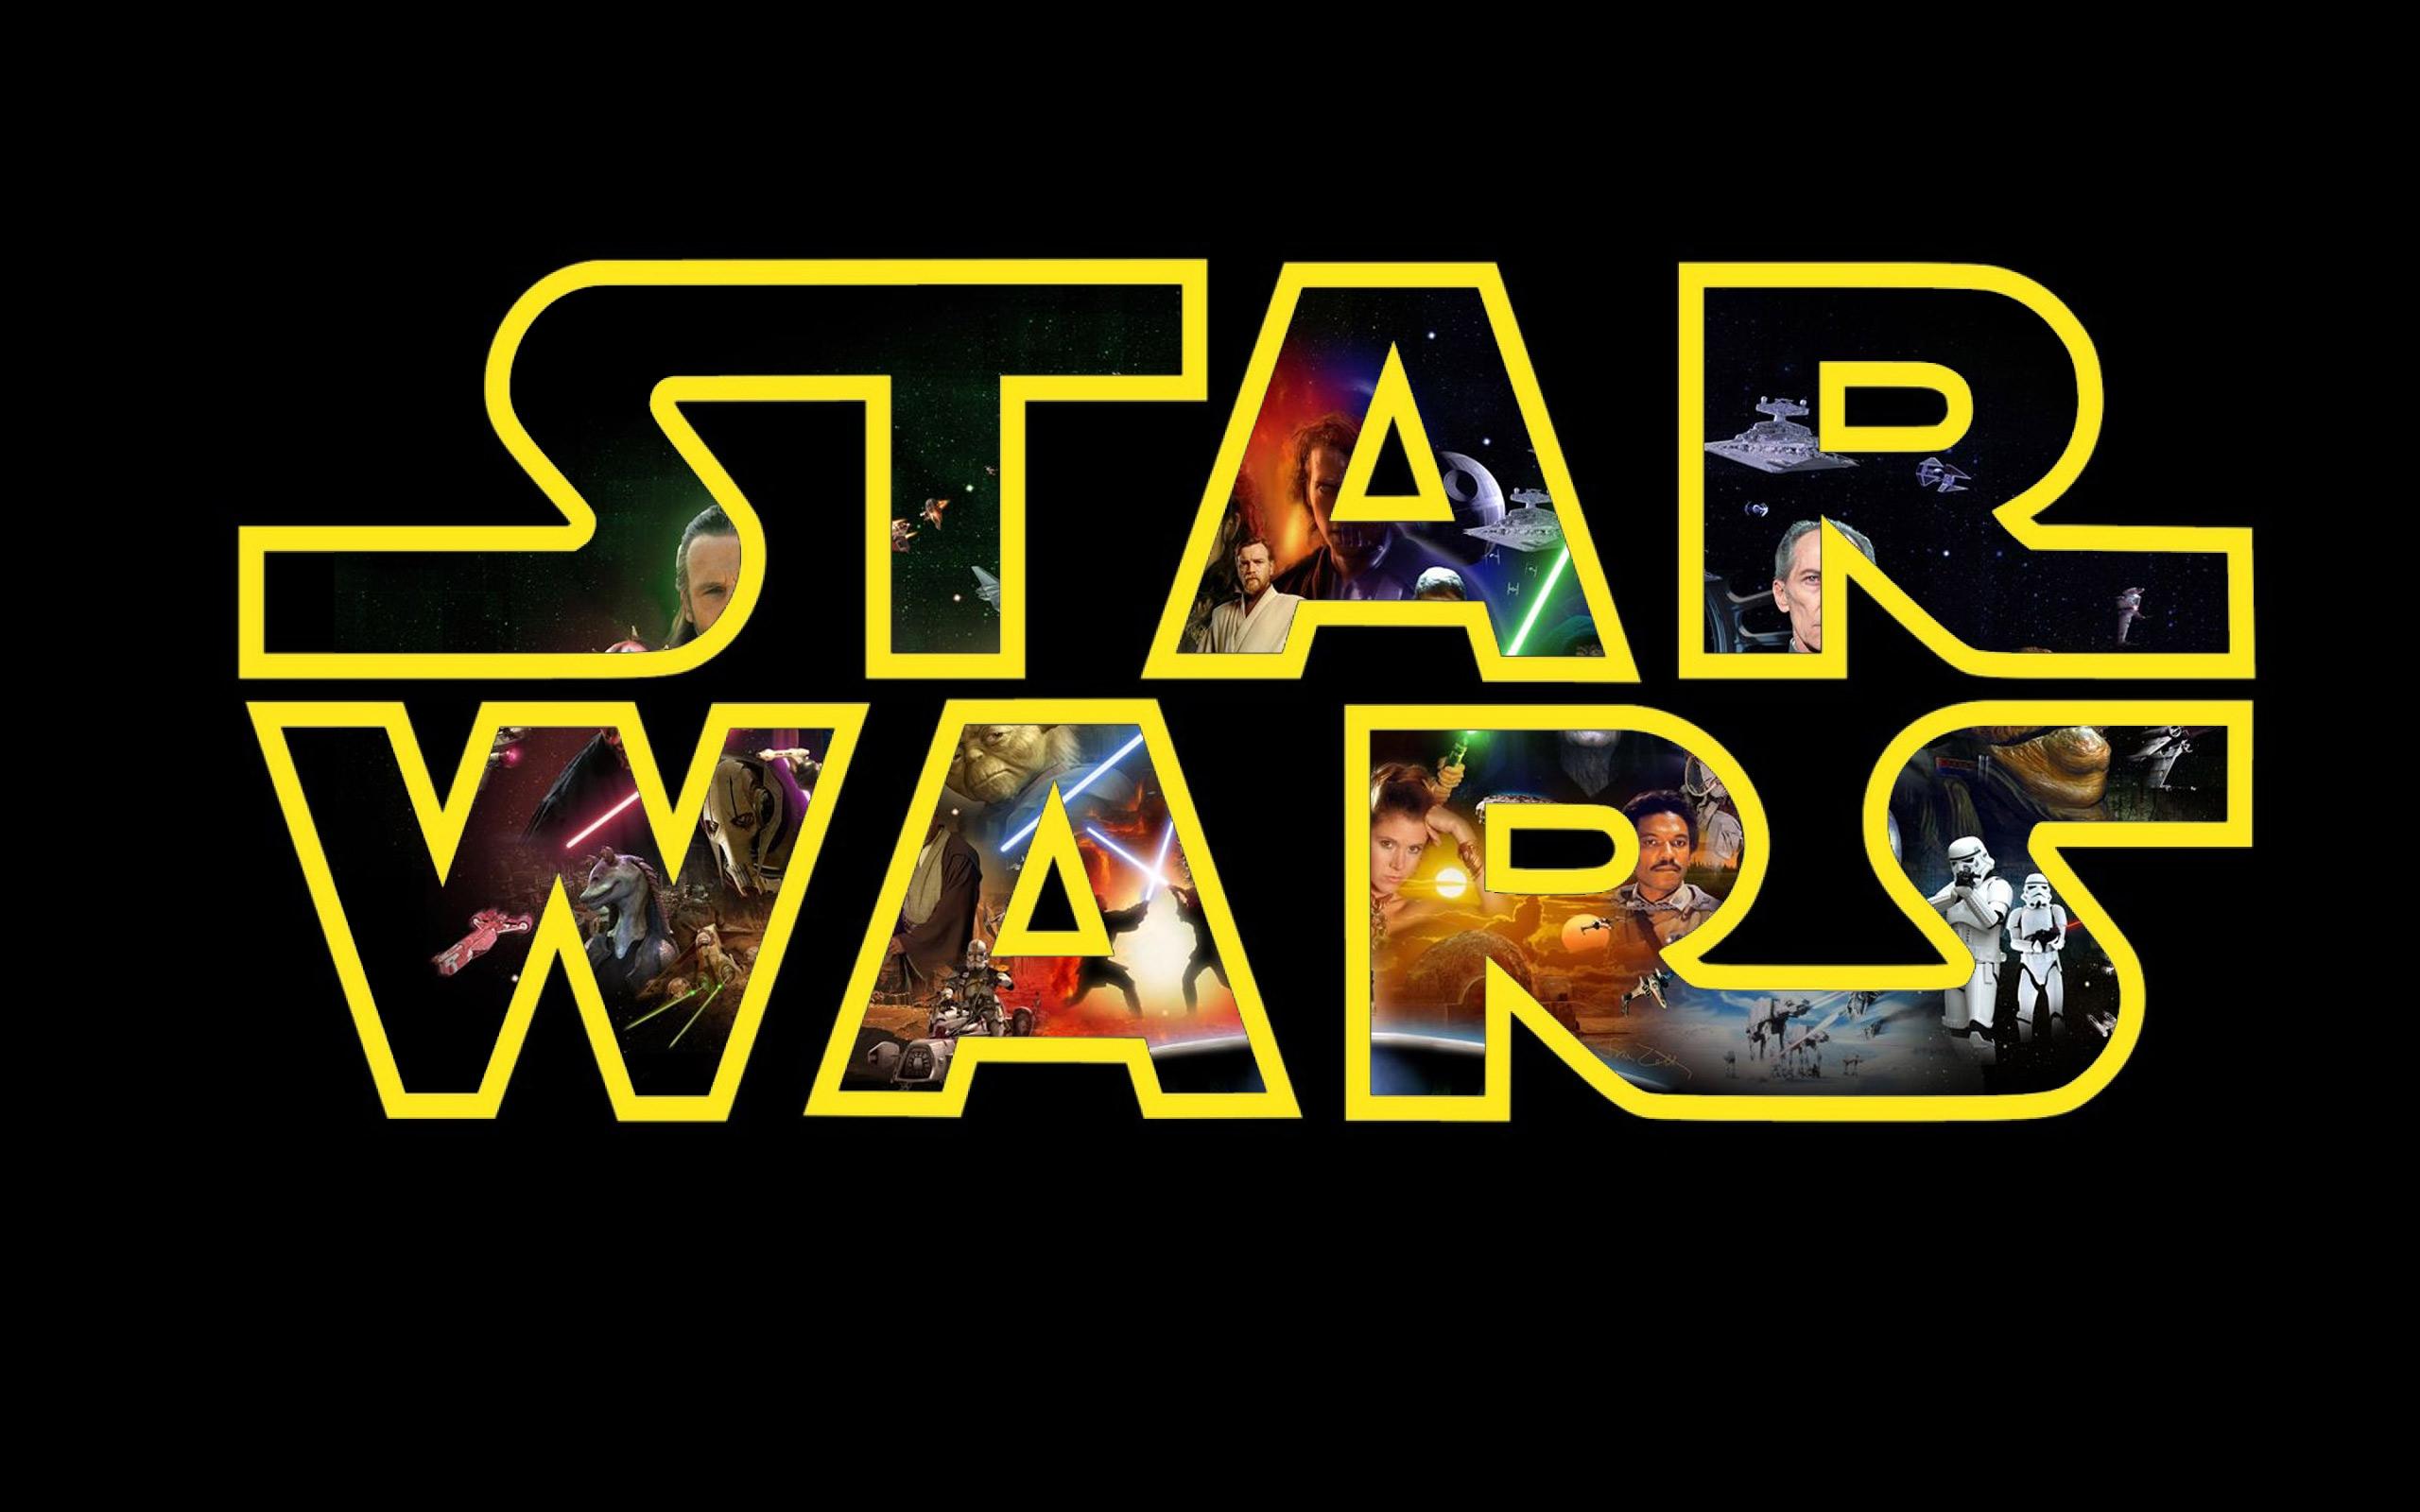 48 Free Desktop Wallpaper Star Wars On Wallpapersafari